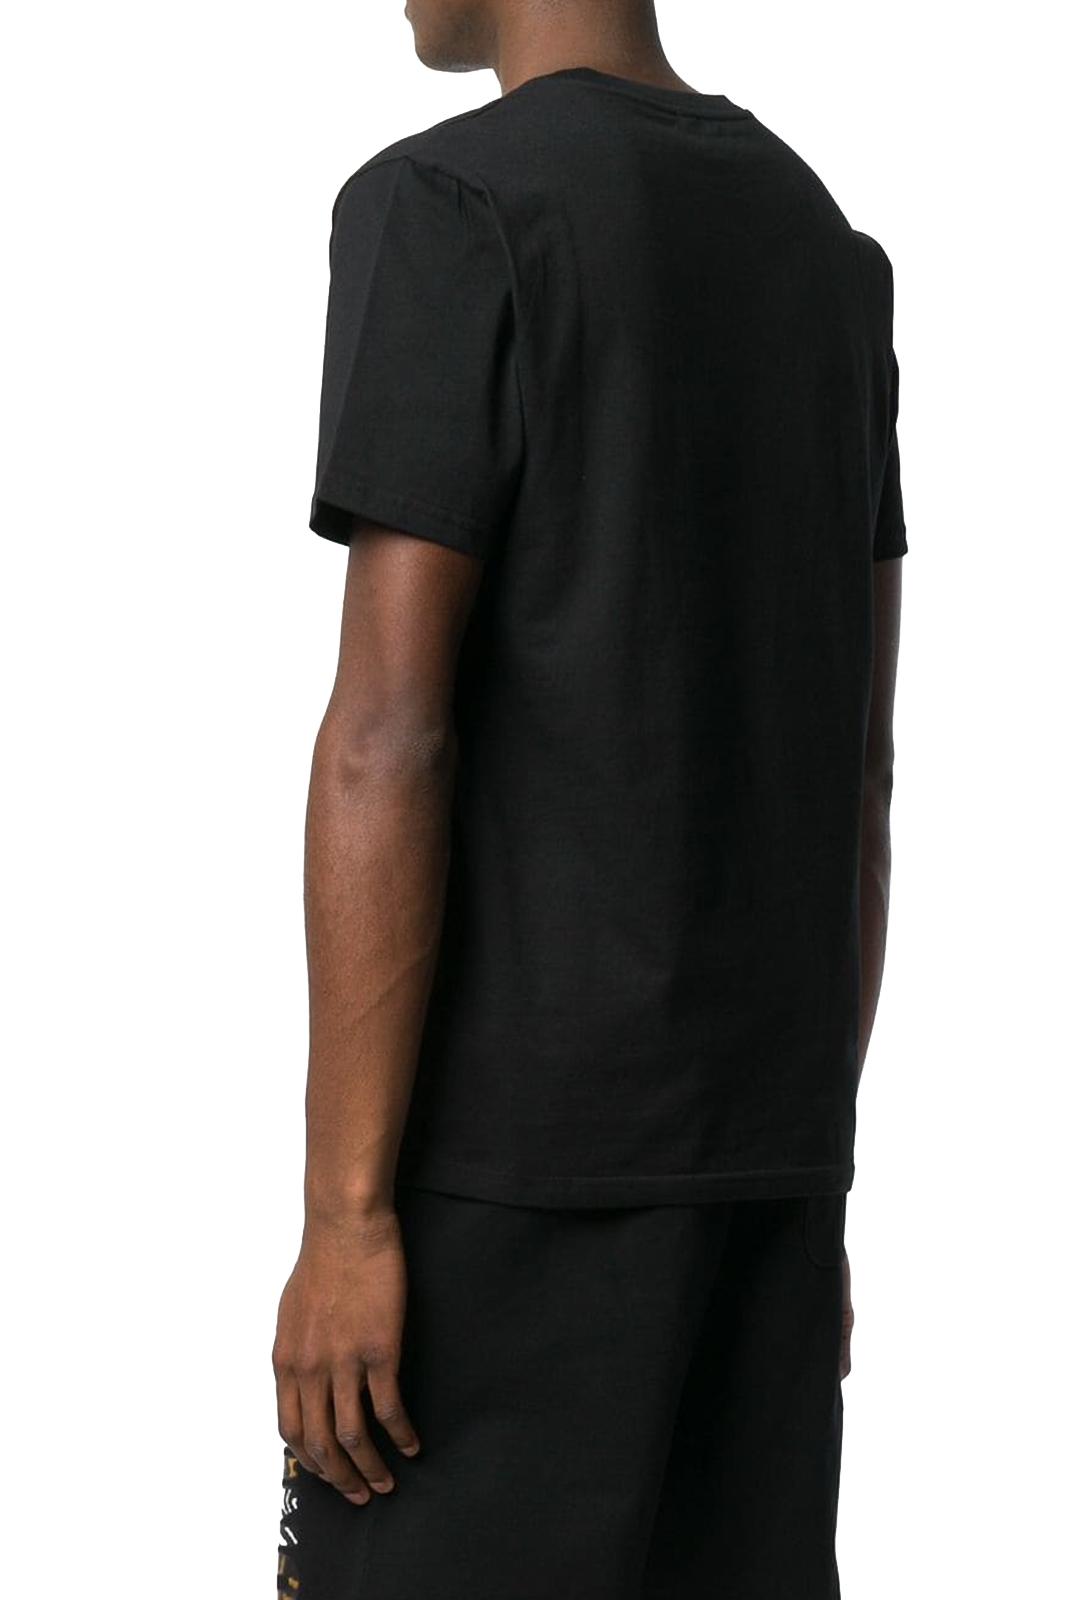 Tee-shirts  Moschino 3V1903 0555 BLACK